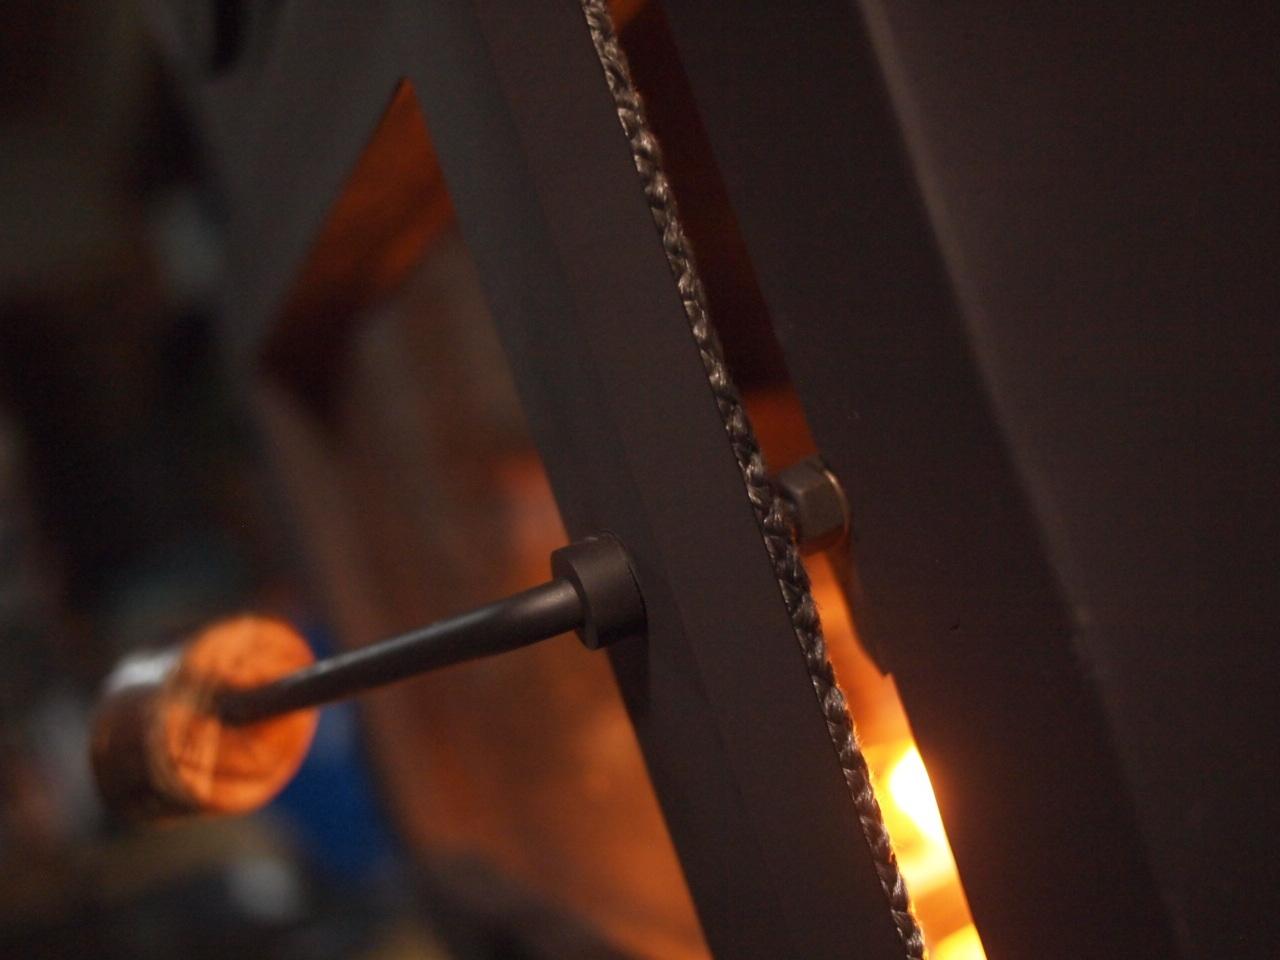 kintoku-stoveの焚き付けの仕方。_a0206732_19560139.jpg